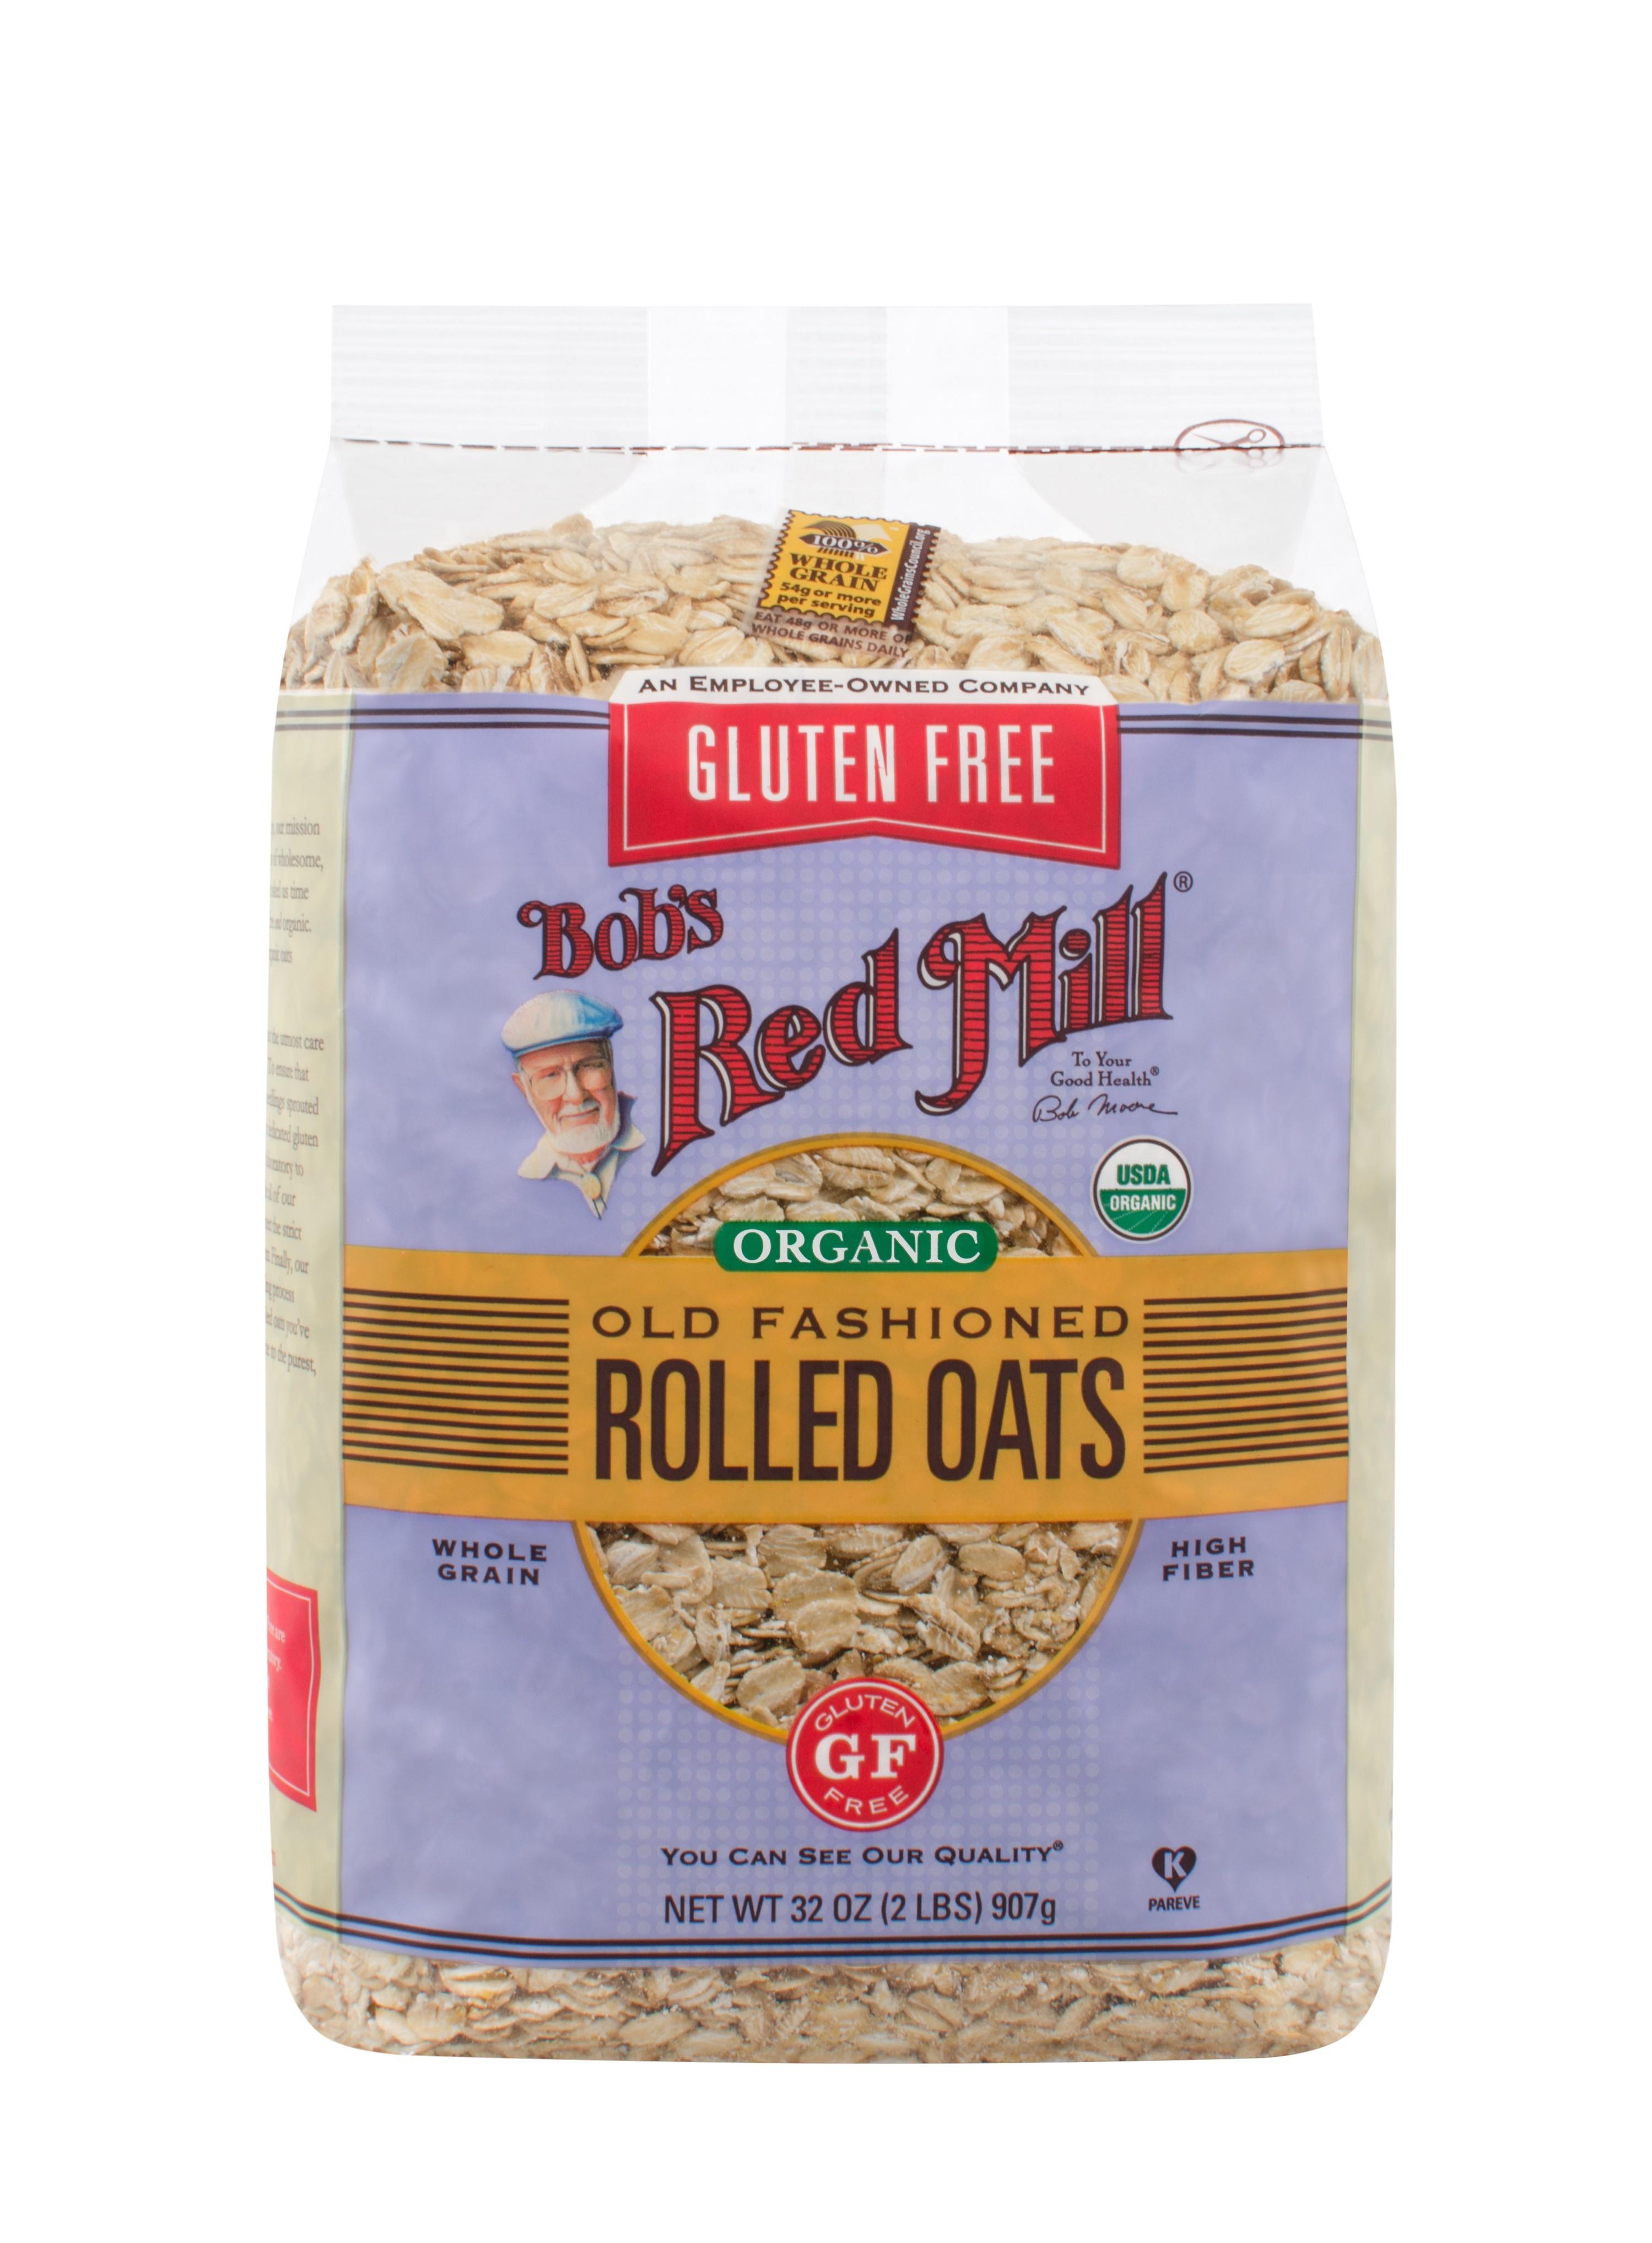 Are Quaker Old Fashioned Oats Gluten Free  are whole grain oats gluten free